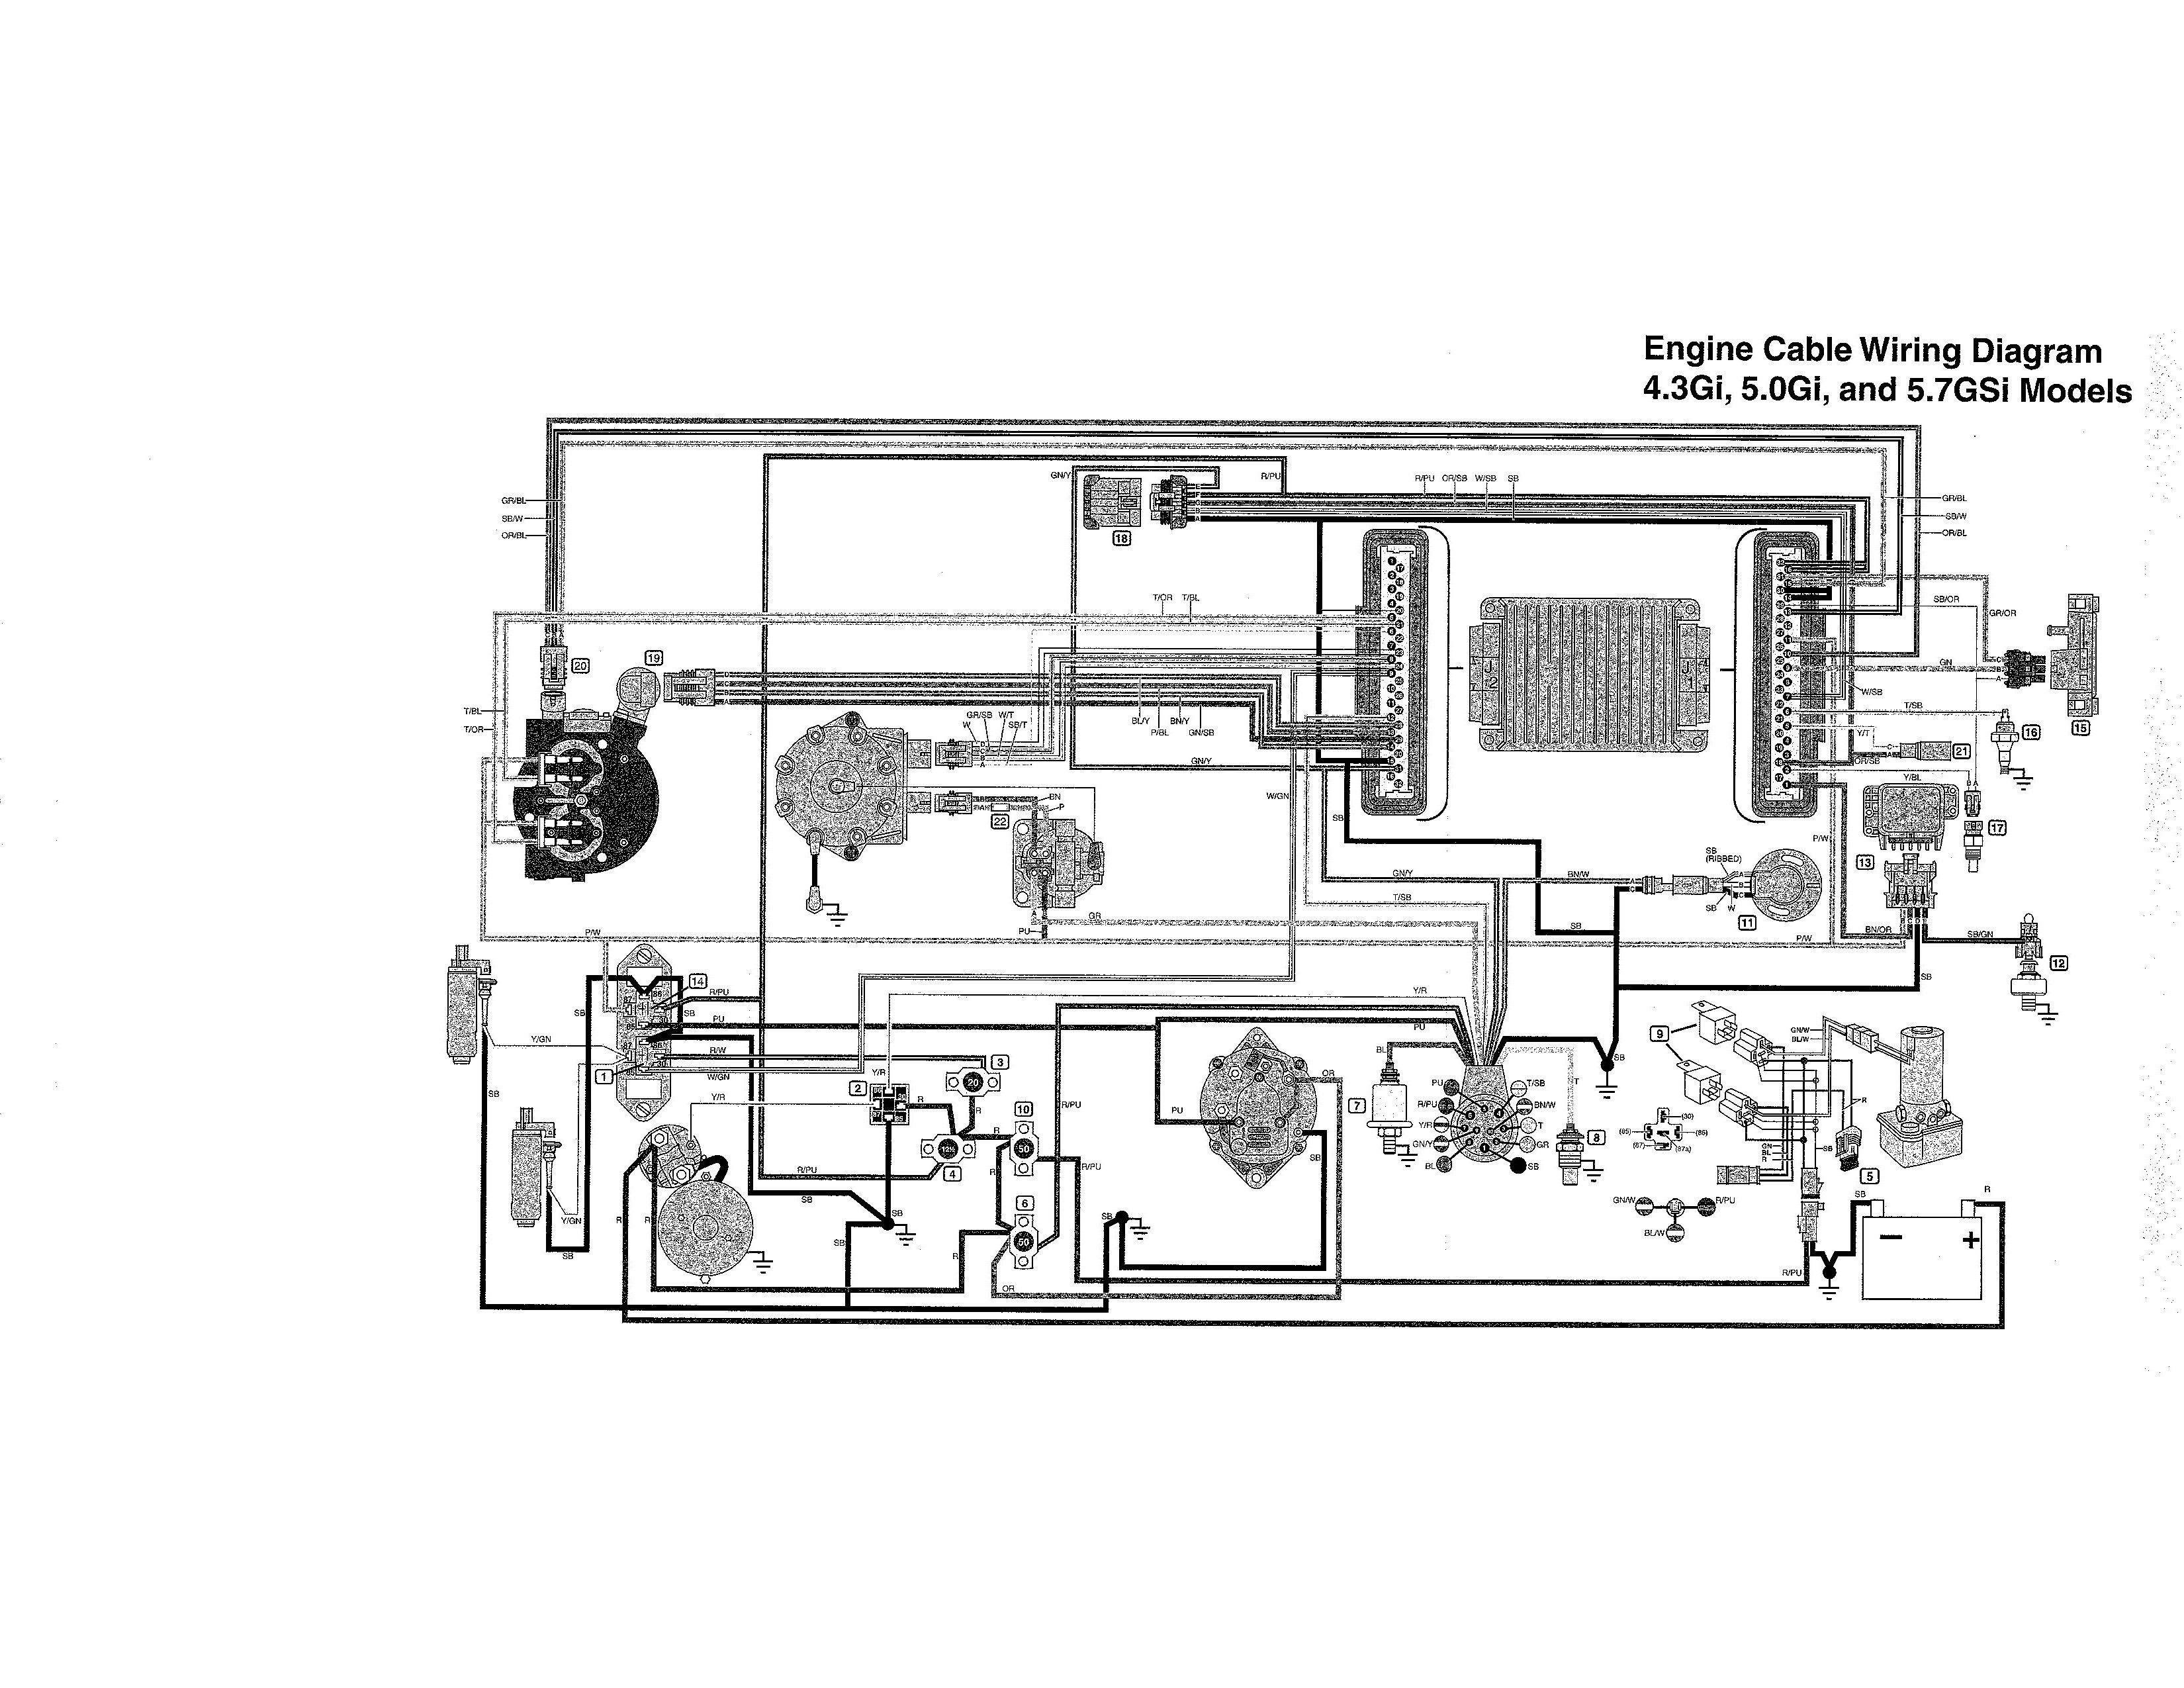 699b487c3b32c752f7dc78cb9bf55054 1998 volvo penta fuel pump wiring diagram boat pinterest volvo